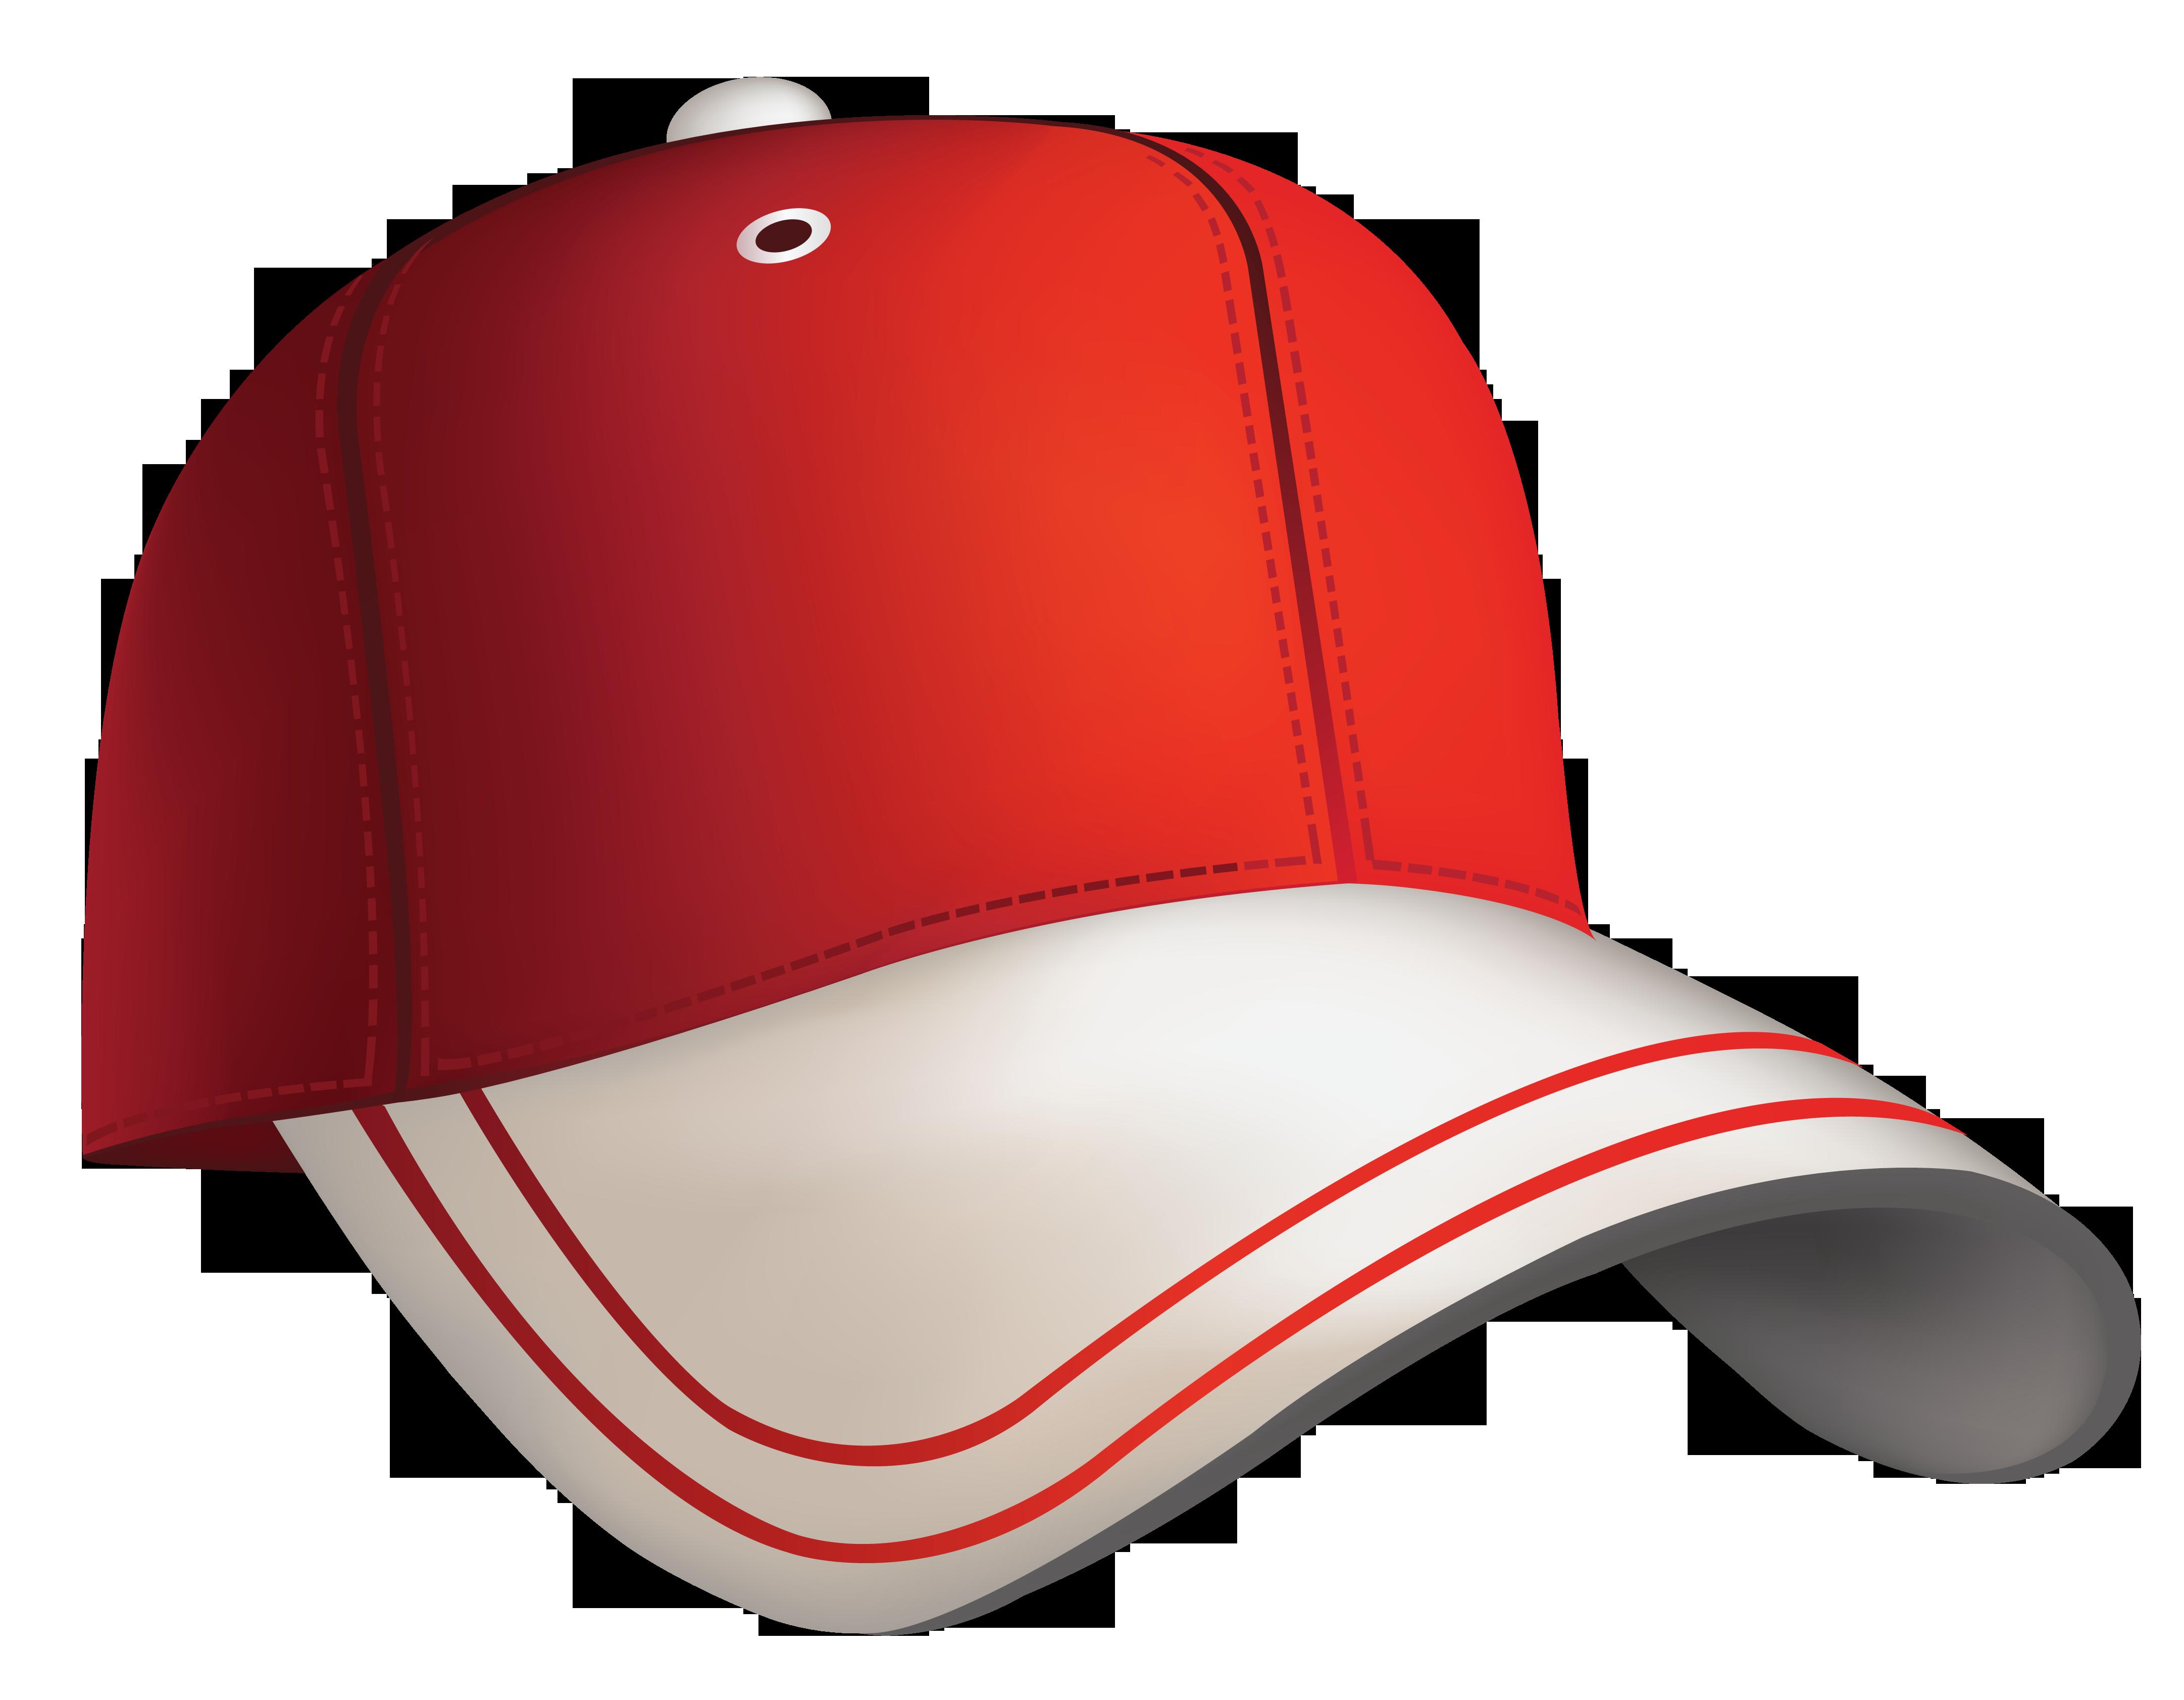 Red Baseball Cap Clipart-Red Baseball Cap Clipart-6